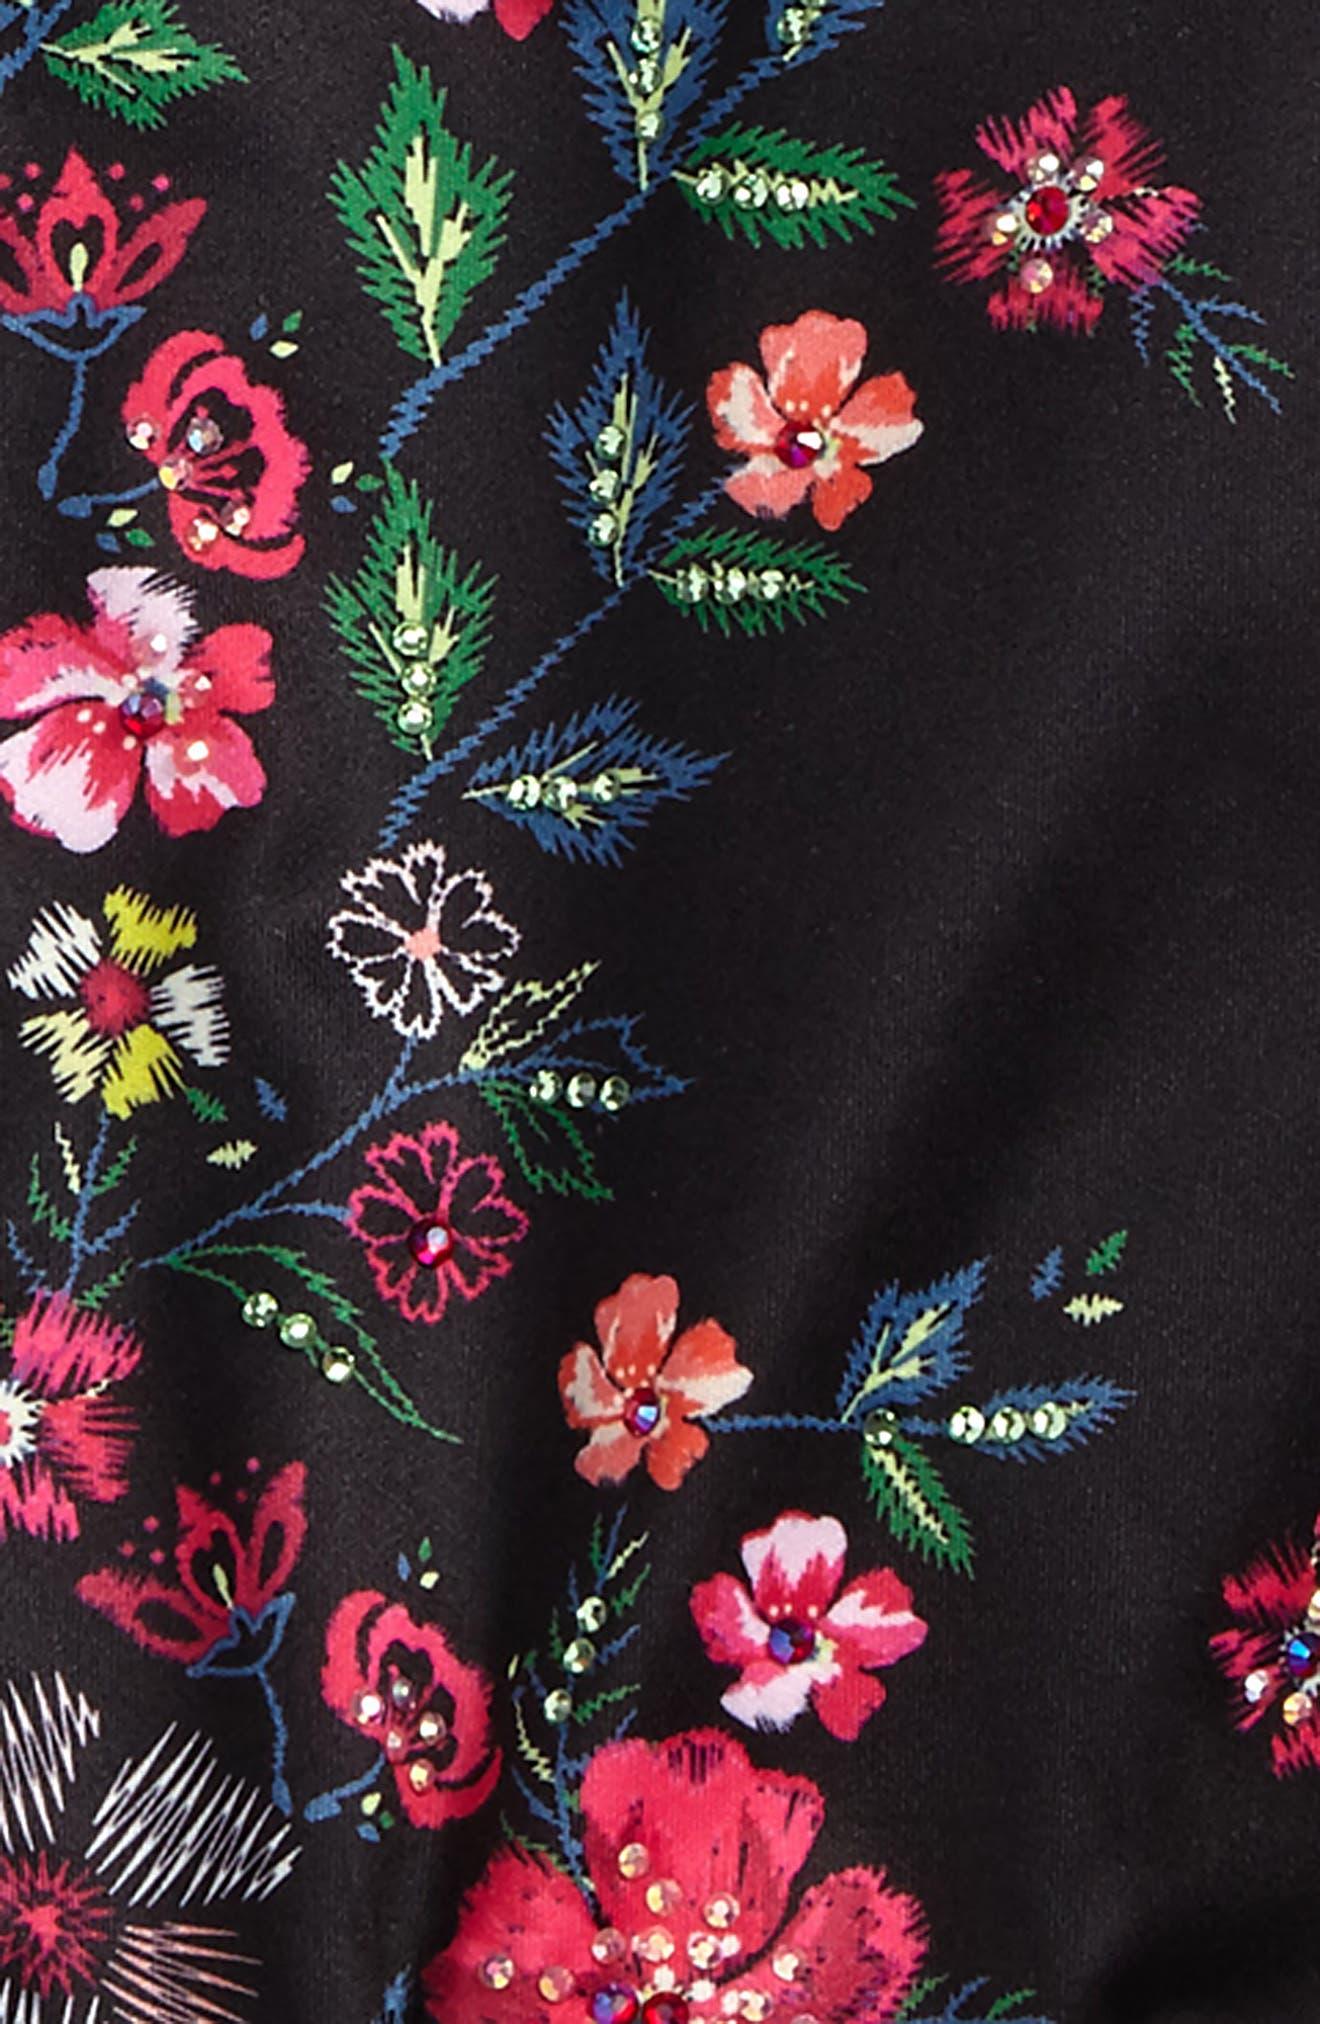 Floral Print Bomber Jacket,                             Alternate thumbnail 2, color,                             001